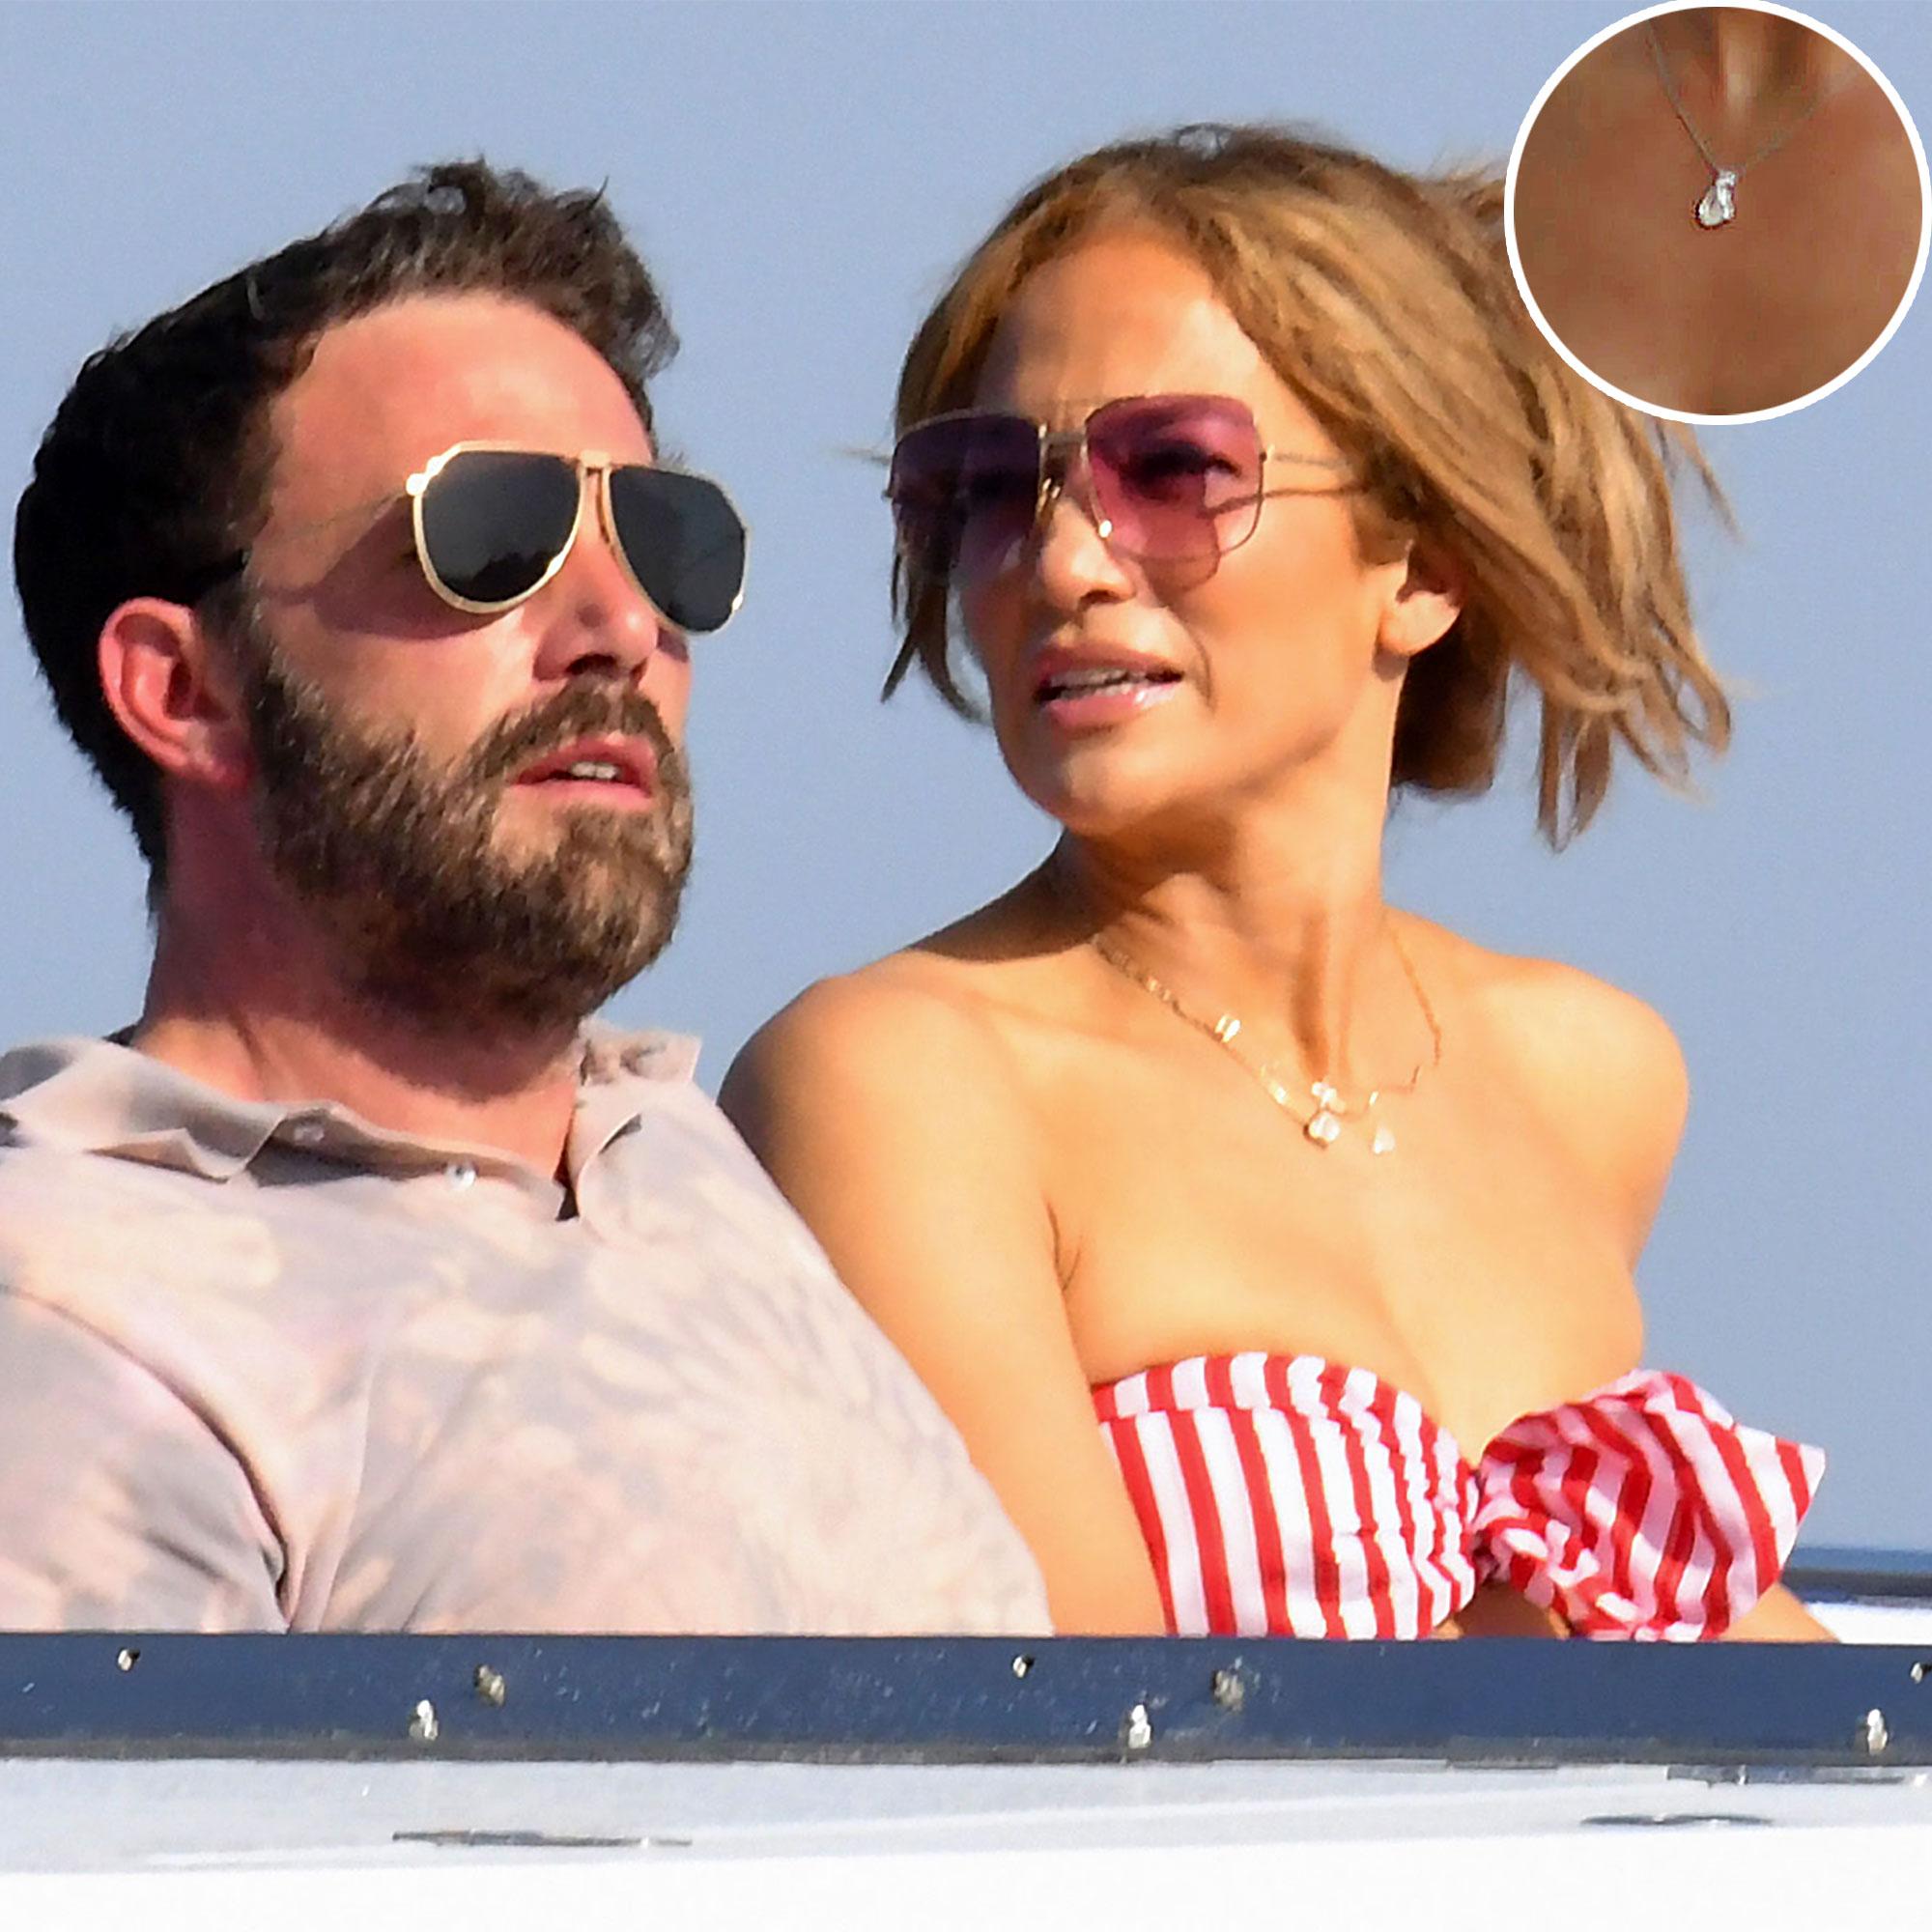 Ben Affleck Got Jennifer Lopez $45,000 Gift to Tell 'Story of Their Love'